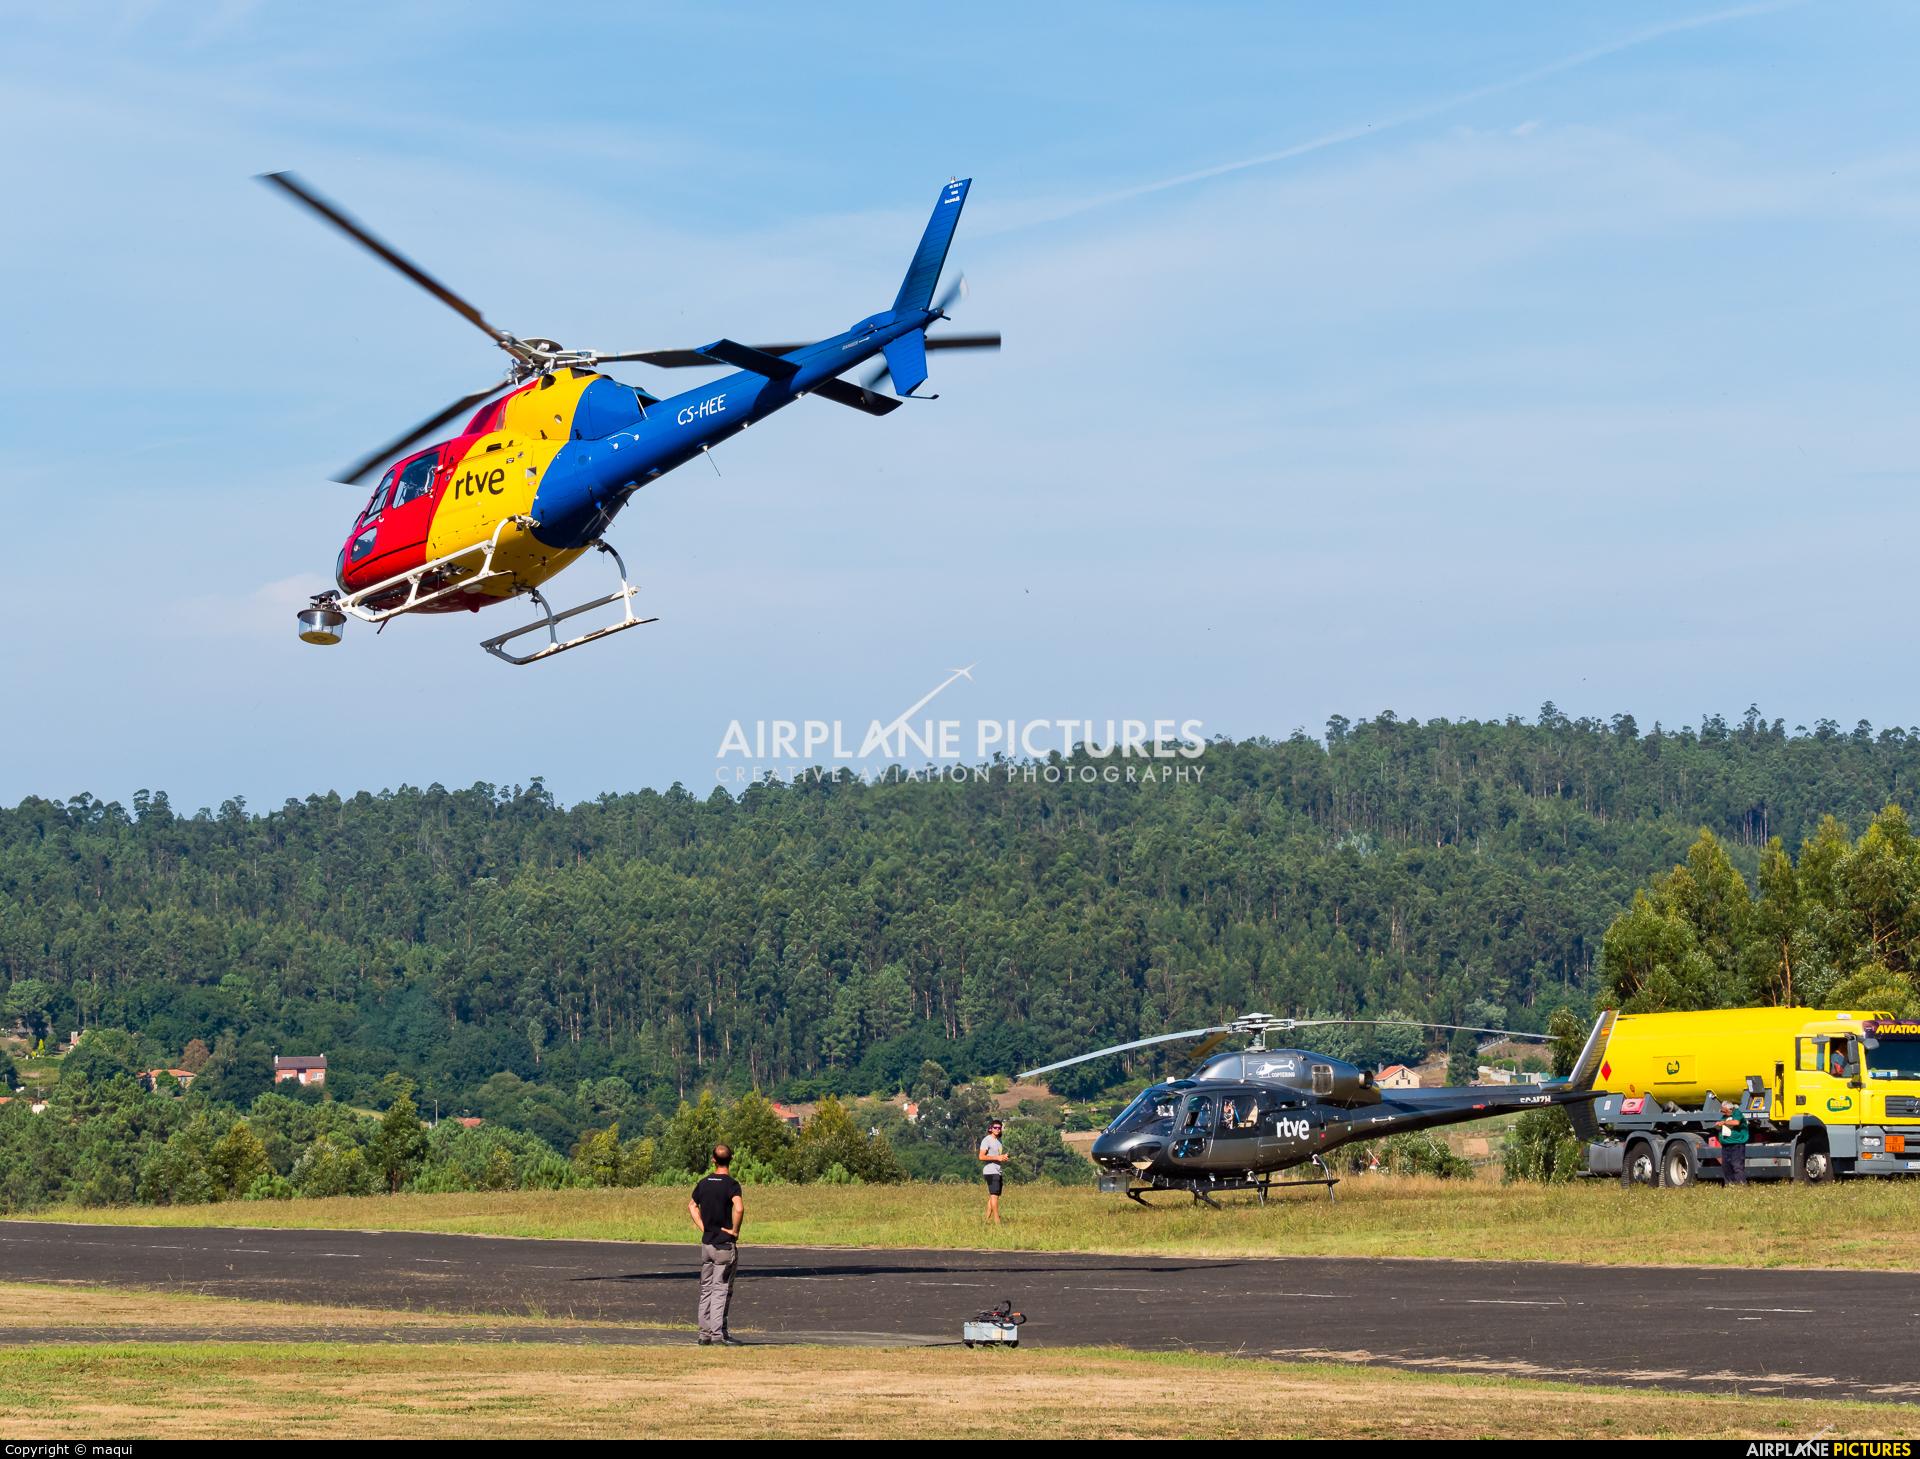 HTA Helicopters CS-HEE aircraft at La Coruña - Off Airport